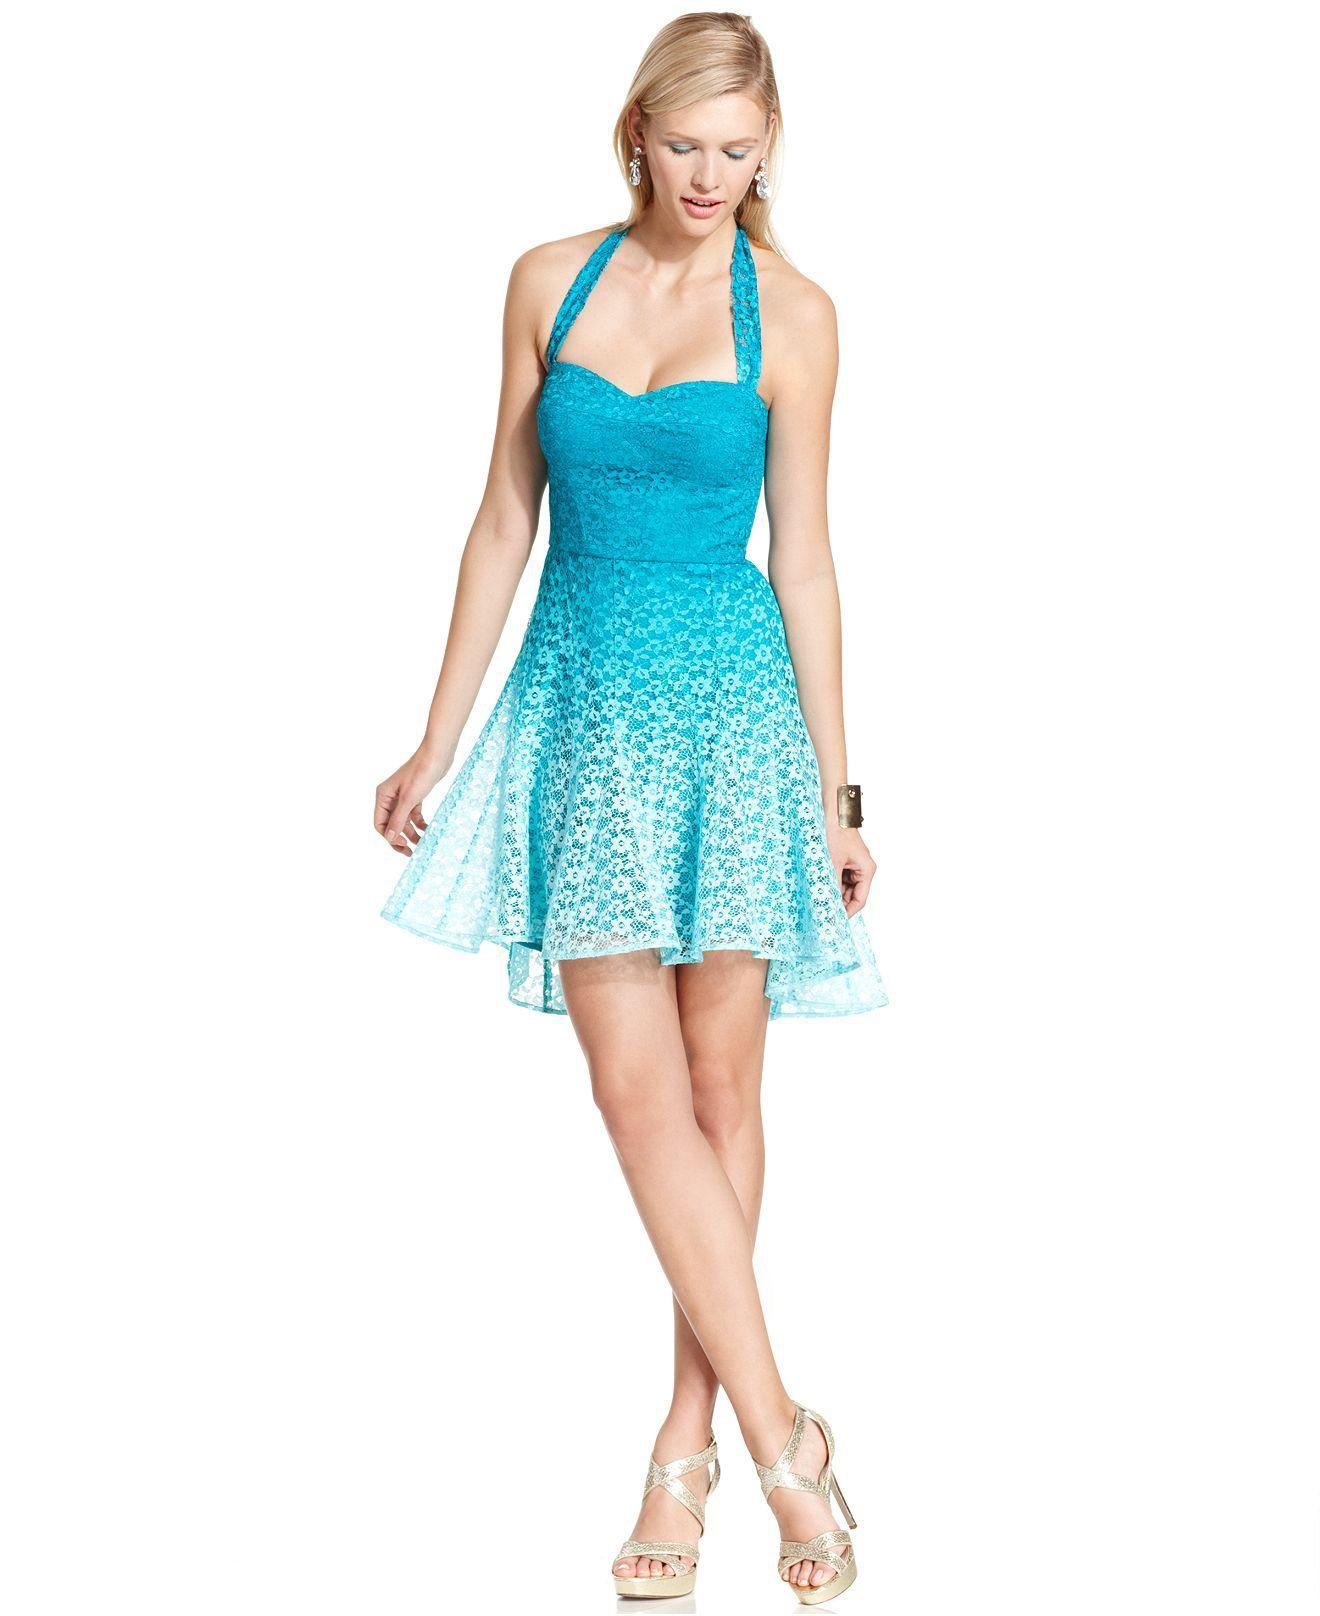 Fine Betsey Johnson Prom Dresses Sketch - All Wedding Dresses ...